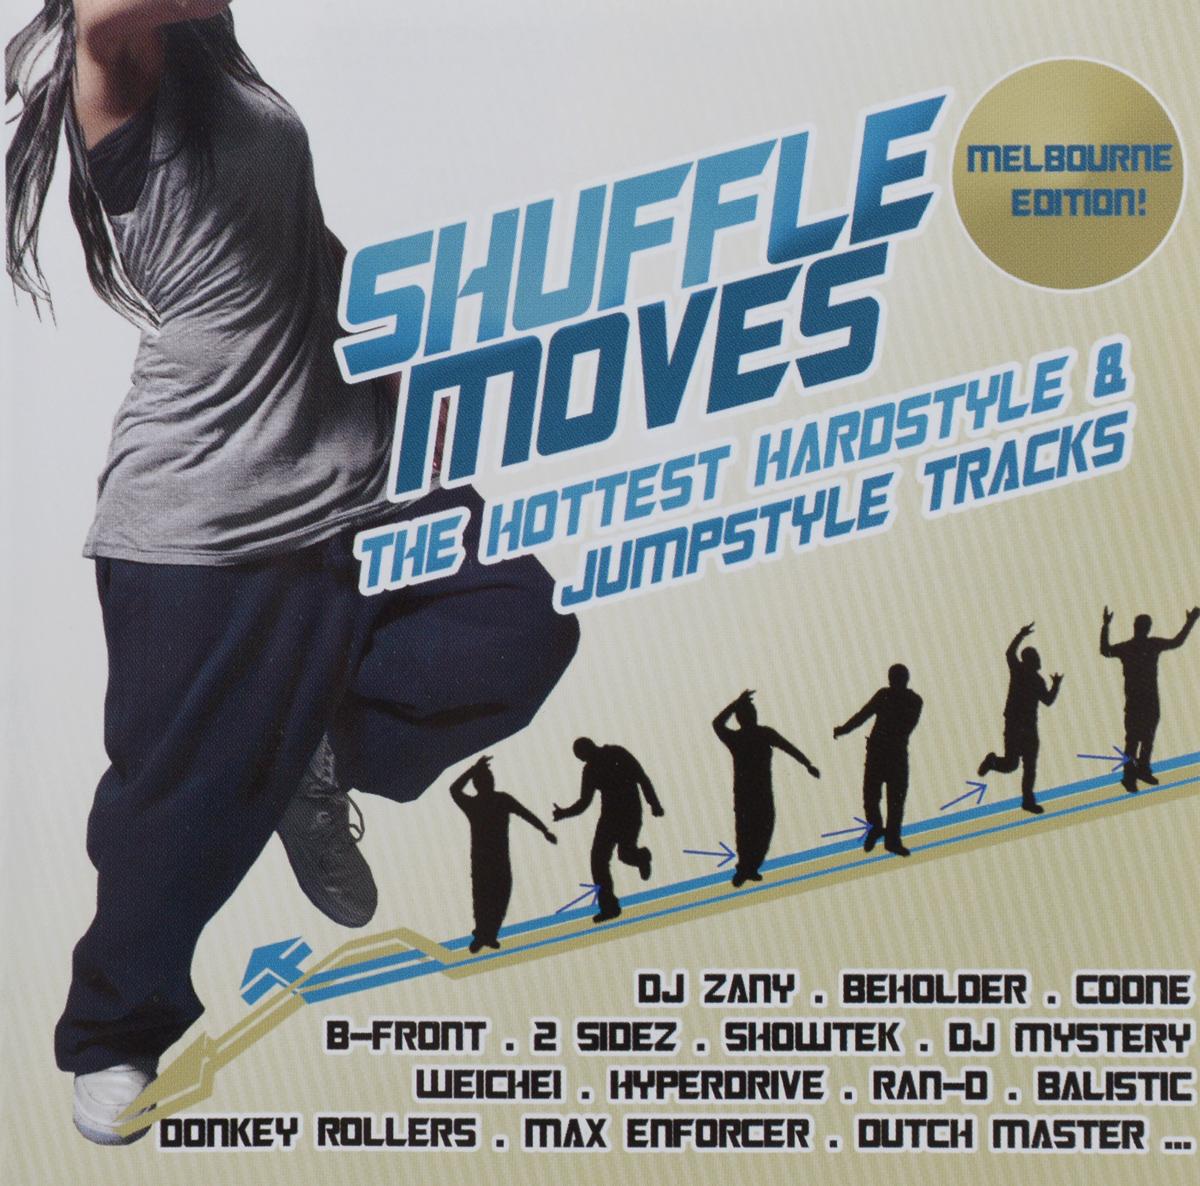 The Beholder,DJ Zany,Max Enforcer,Luna,Dutch Master,B-Front,Pulse,DJ Coone,Dizmaster,Donkey Rollers Shuffle Moves. The Hottest Hardstyle & Jumpstyle Tracks. Melbourne Edition (2 CD) цена